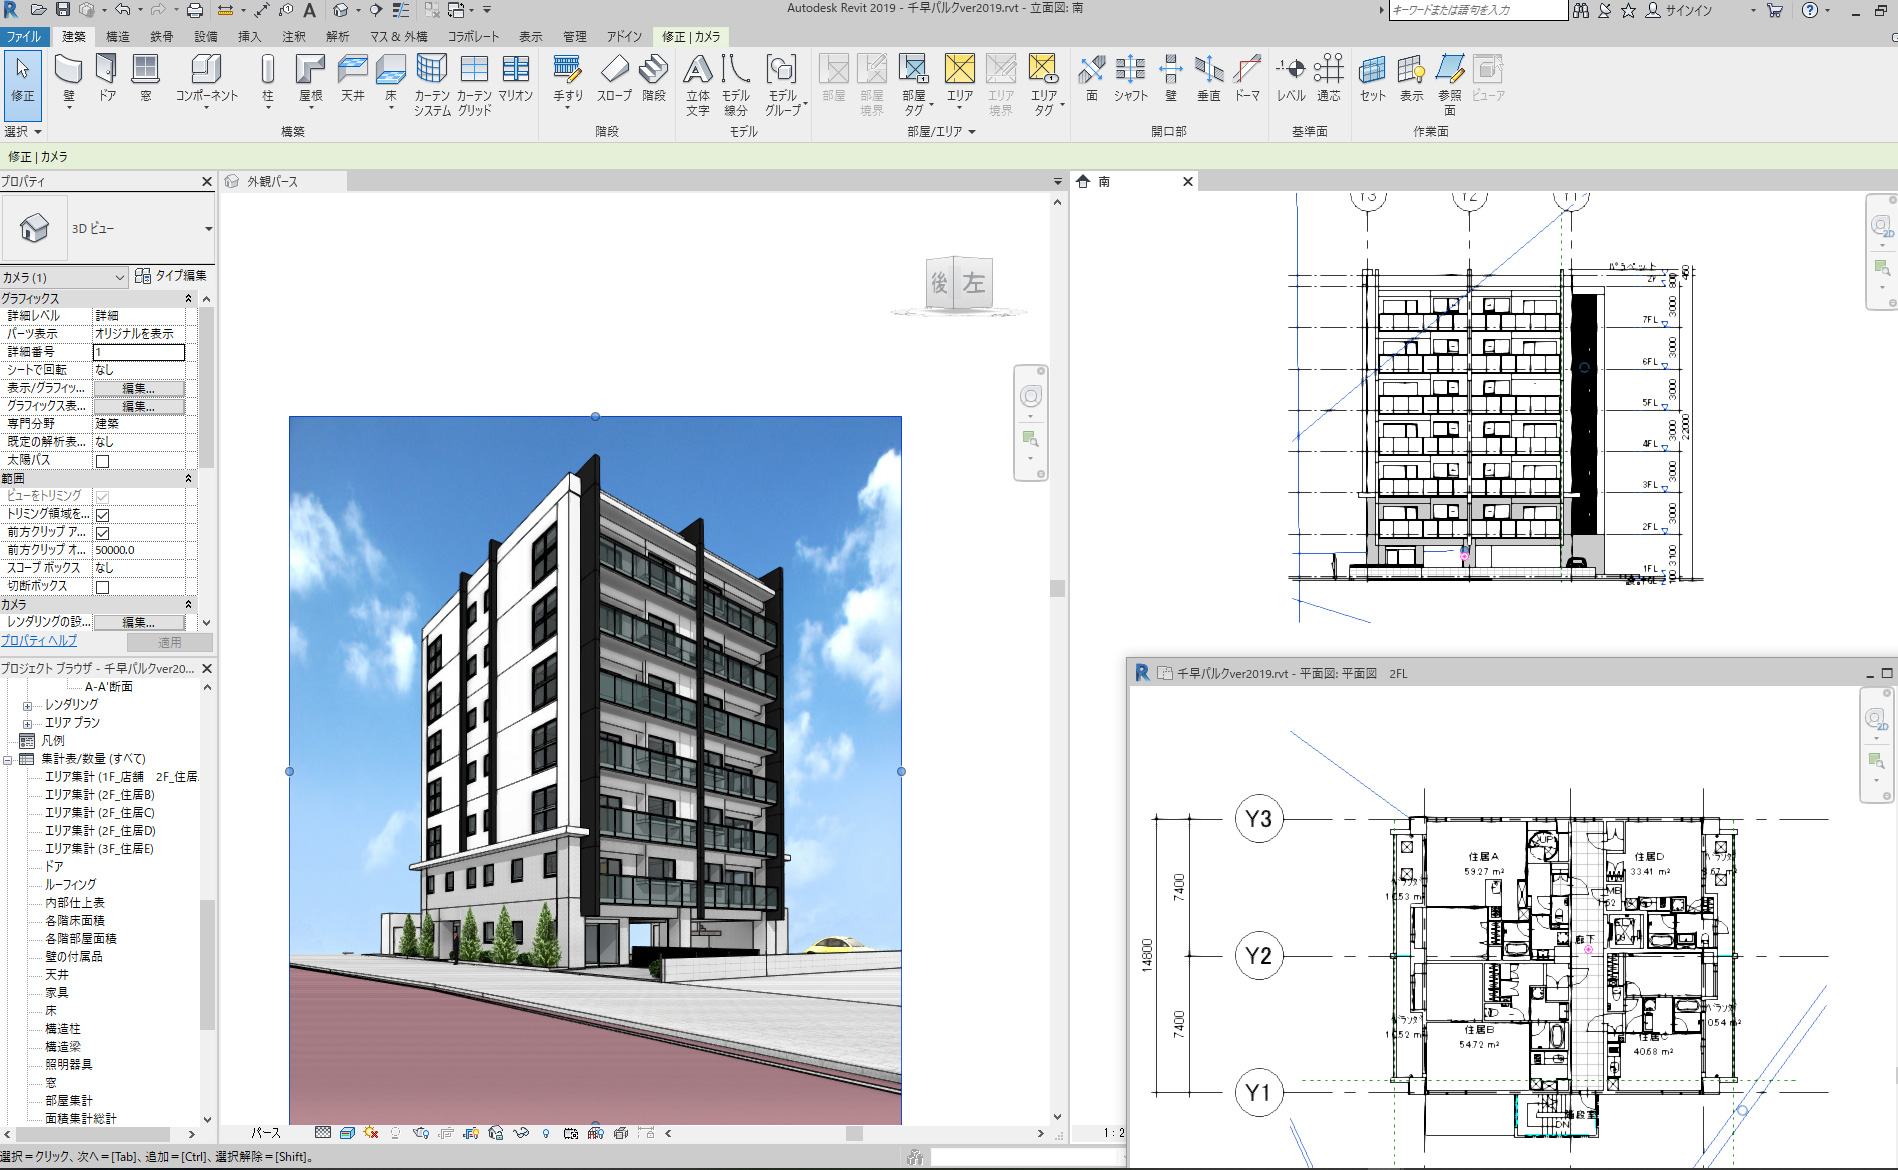 Revit 2019で開いたマンションプロジェクト